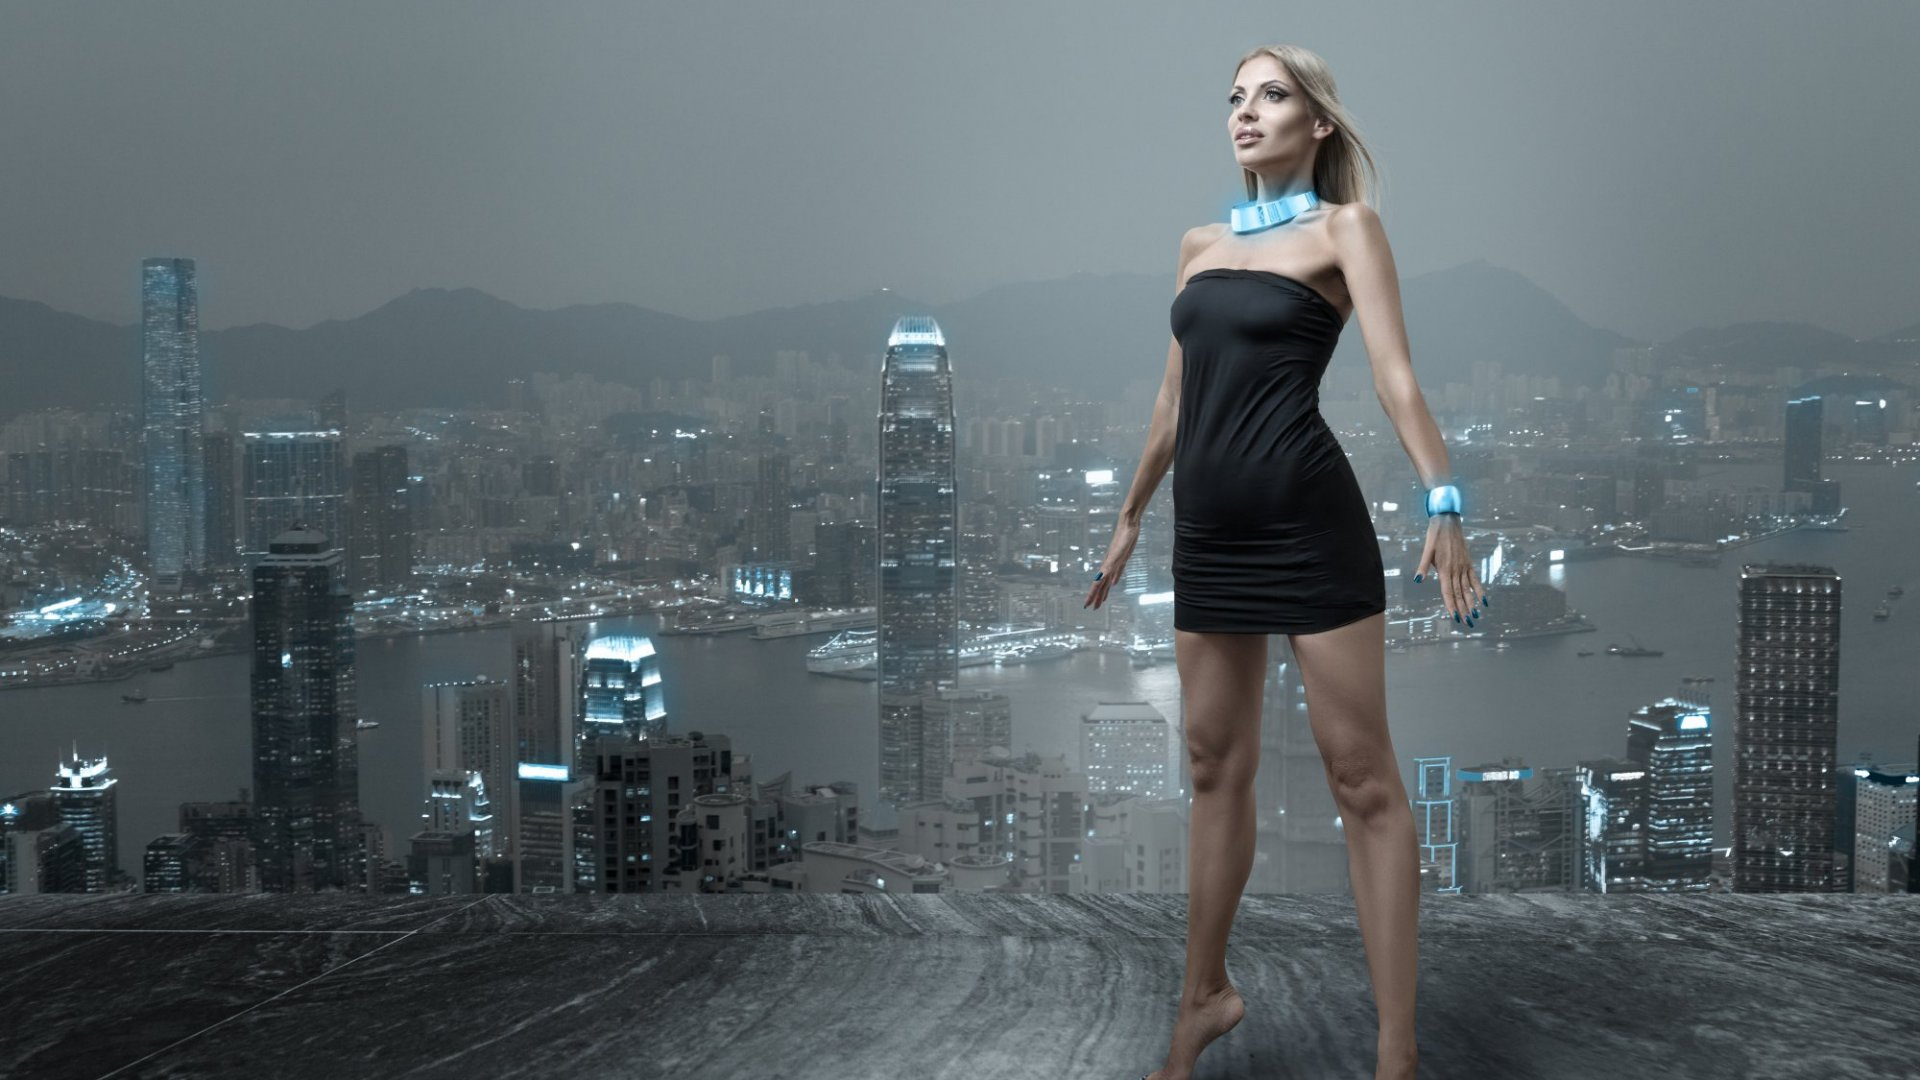 Fashionable futures